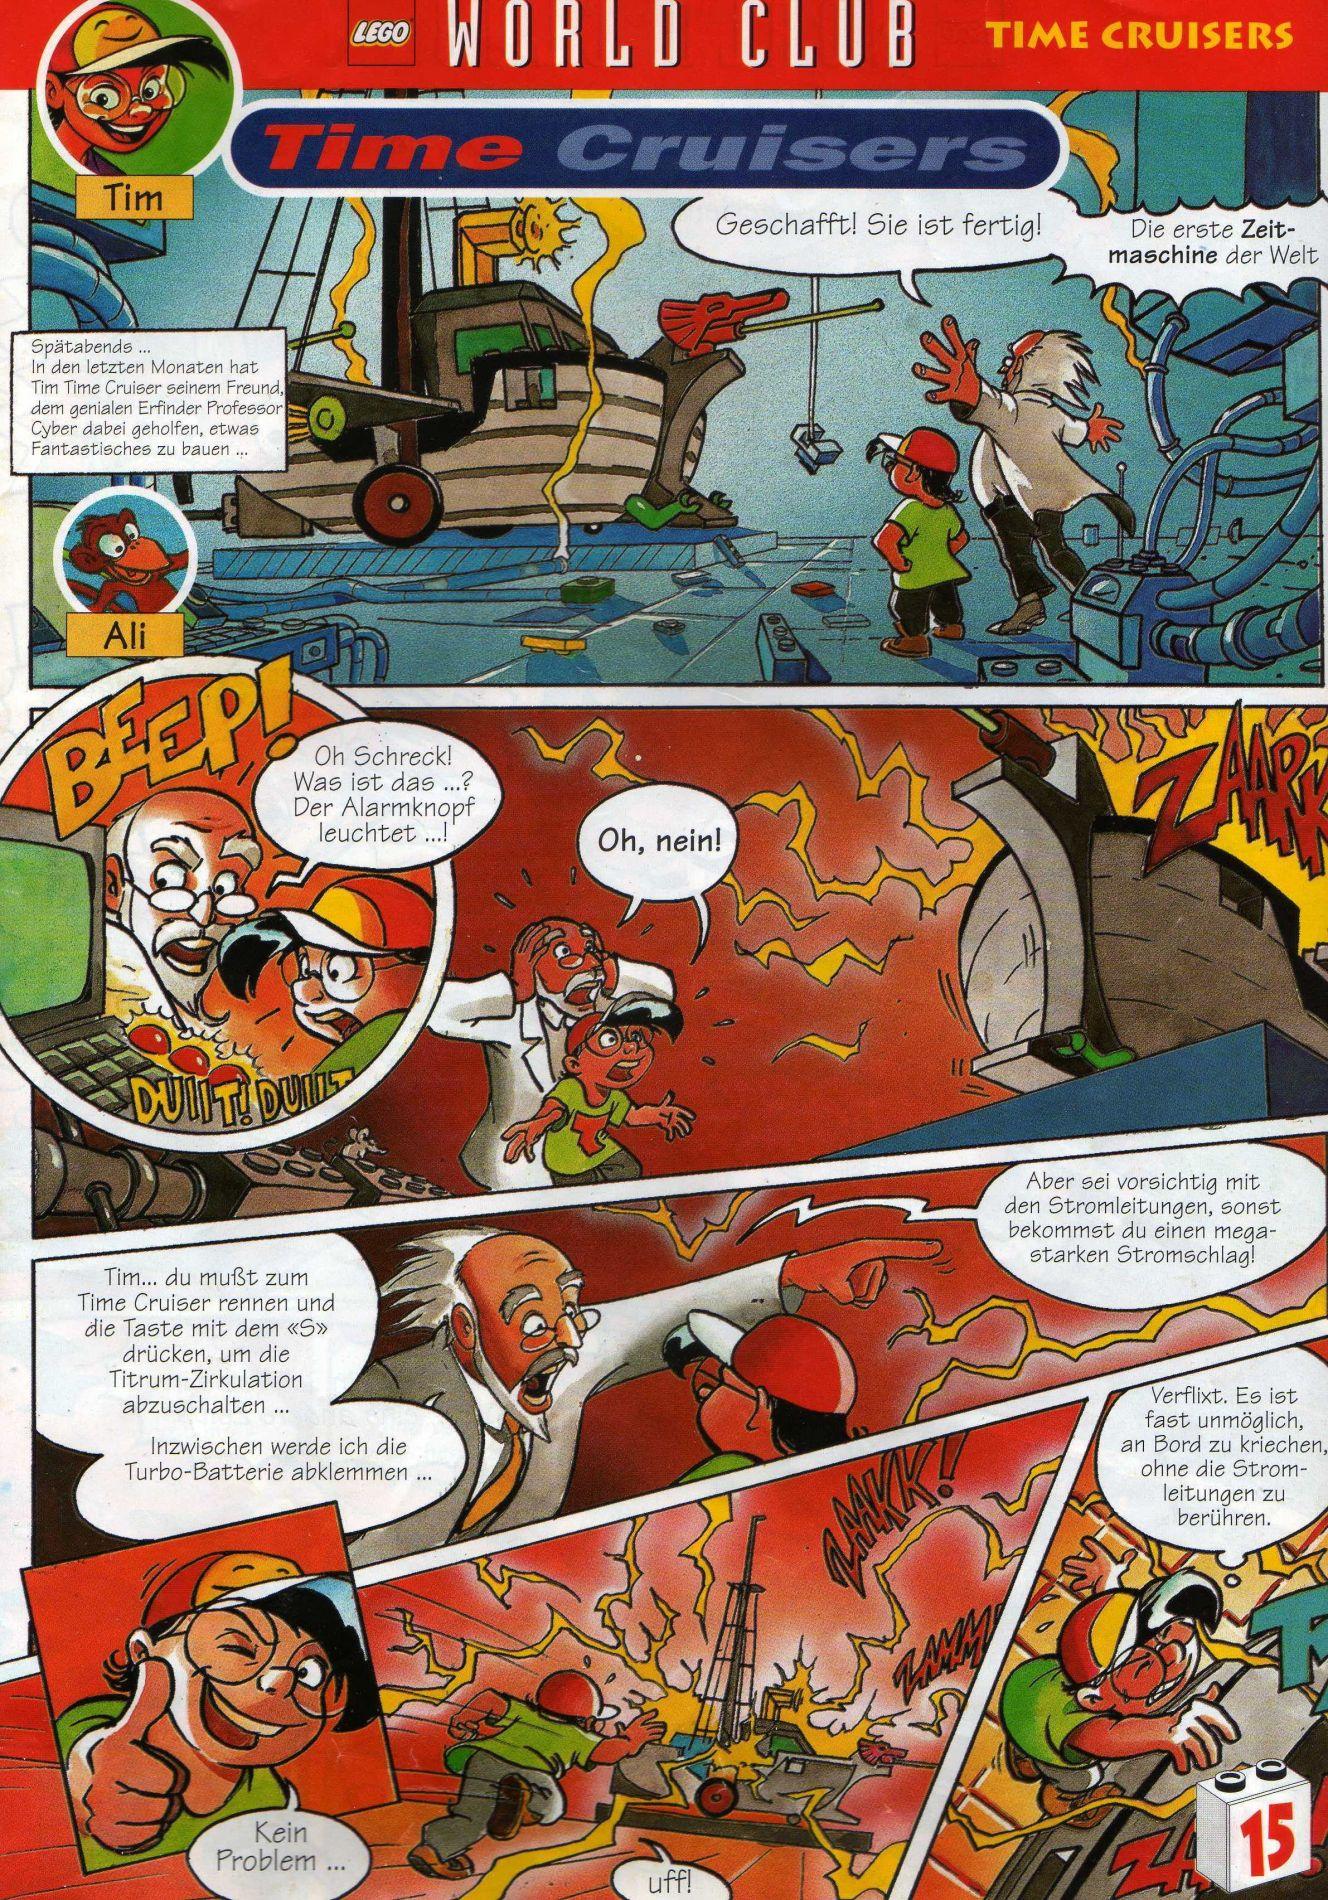 Time Cruisers Comic